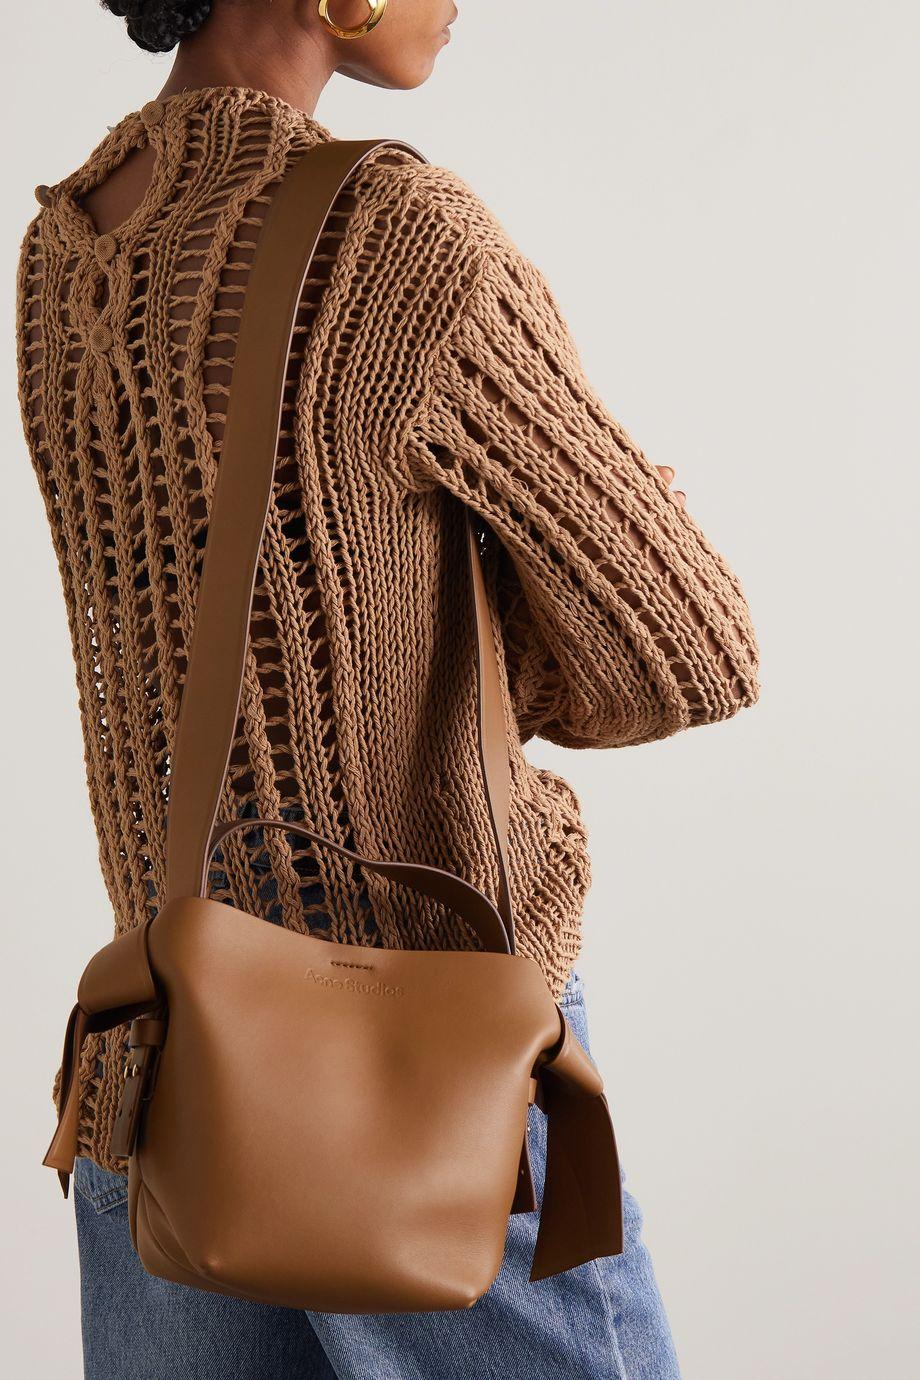 Acne Studios Musubi Mini Schultertasche aus Leder mit Knoten